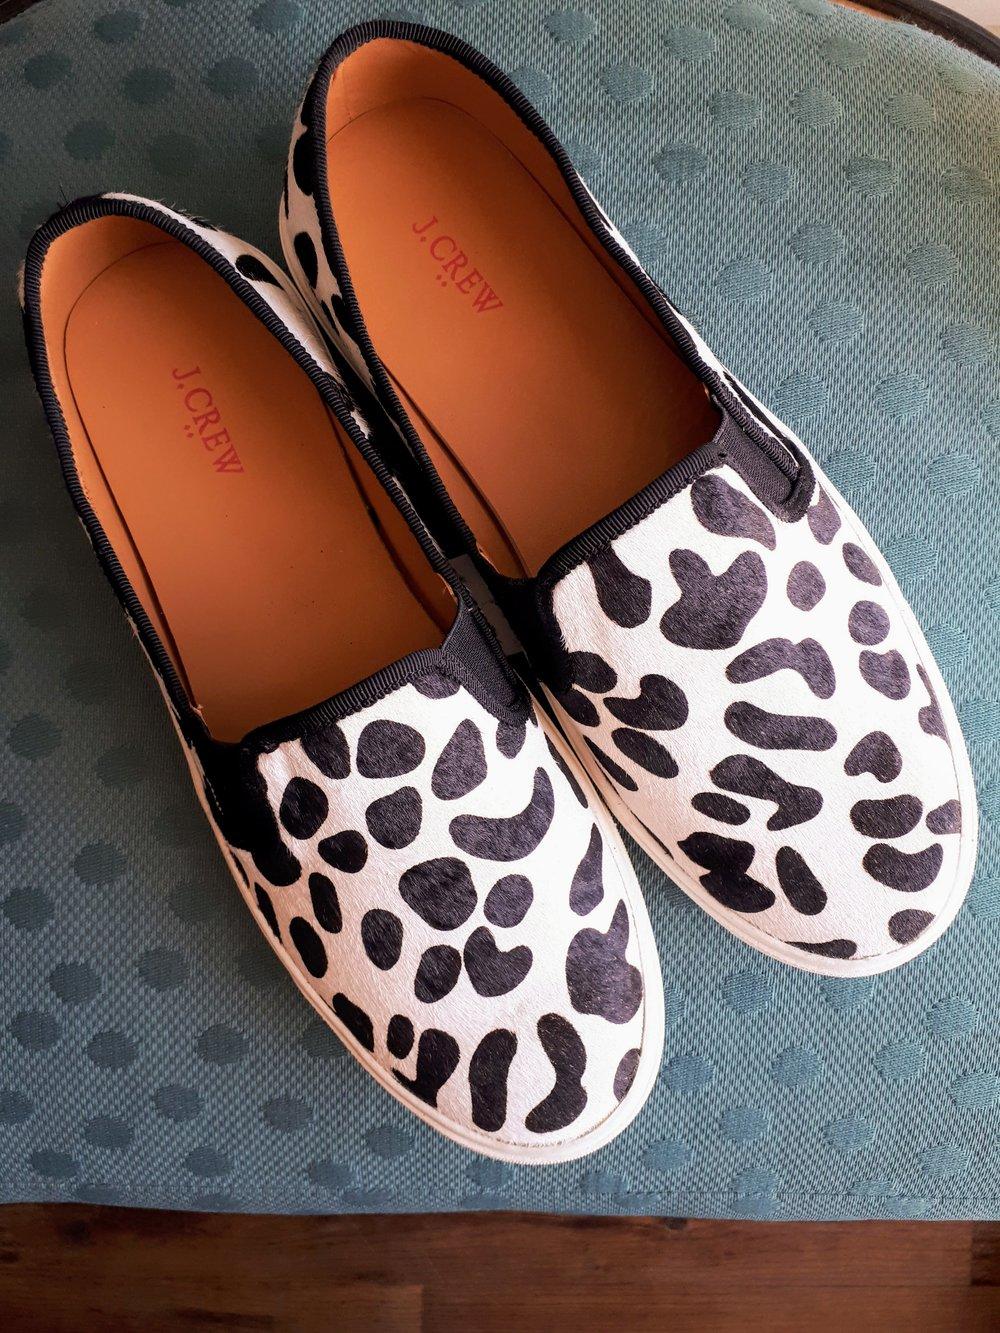 J Crew shoes:S8, $36